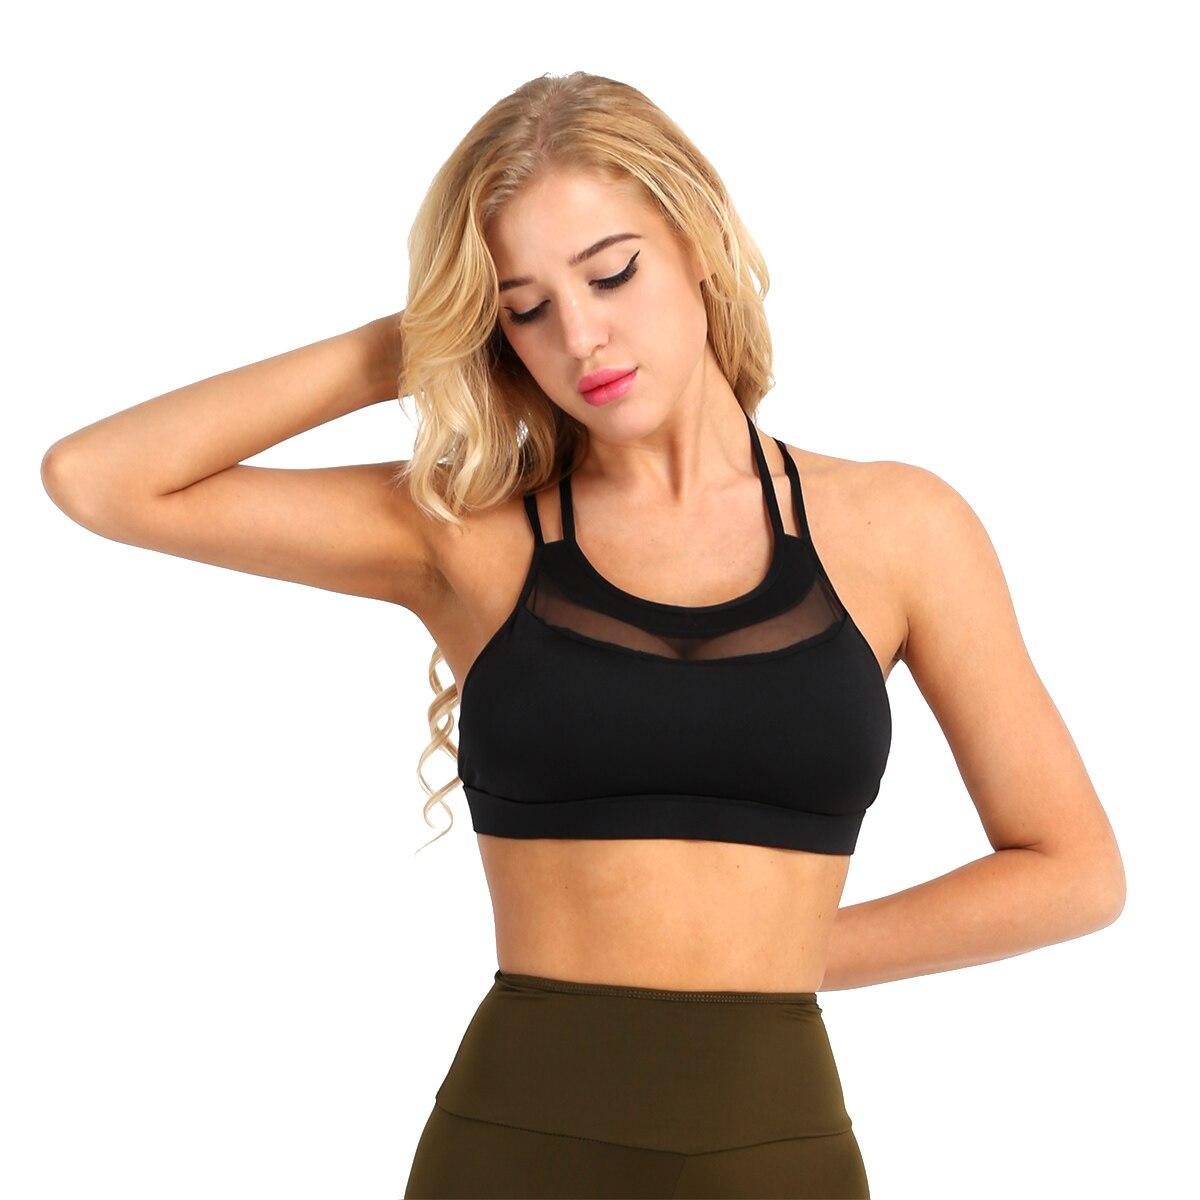 Women Sports Gym Fitness Bra Cross-Strap Splice Ventilated Top Support Bralette